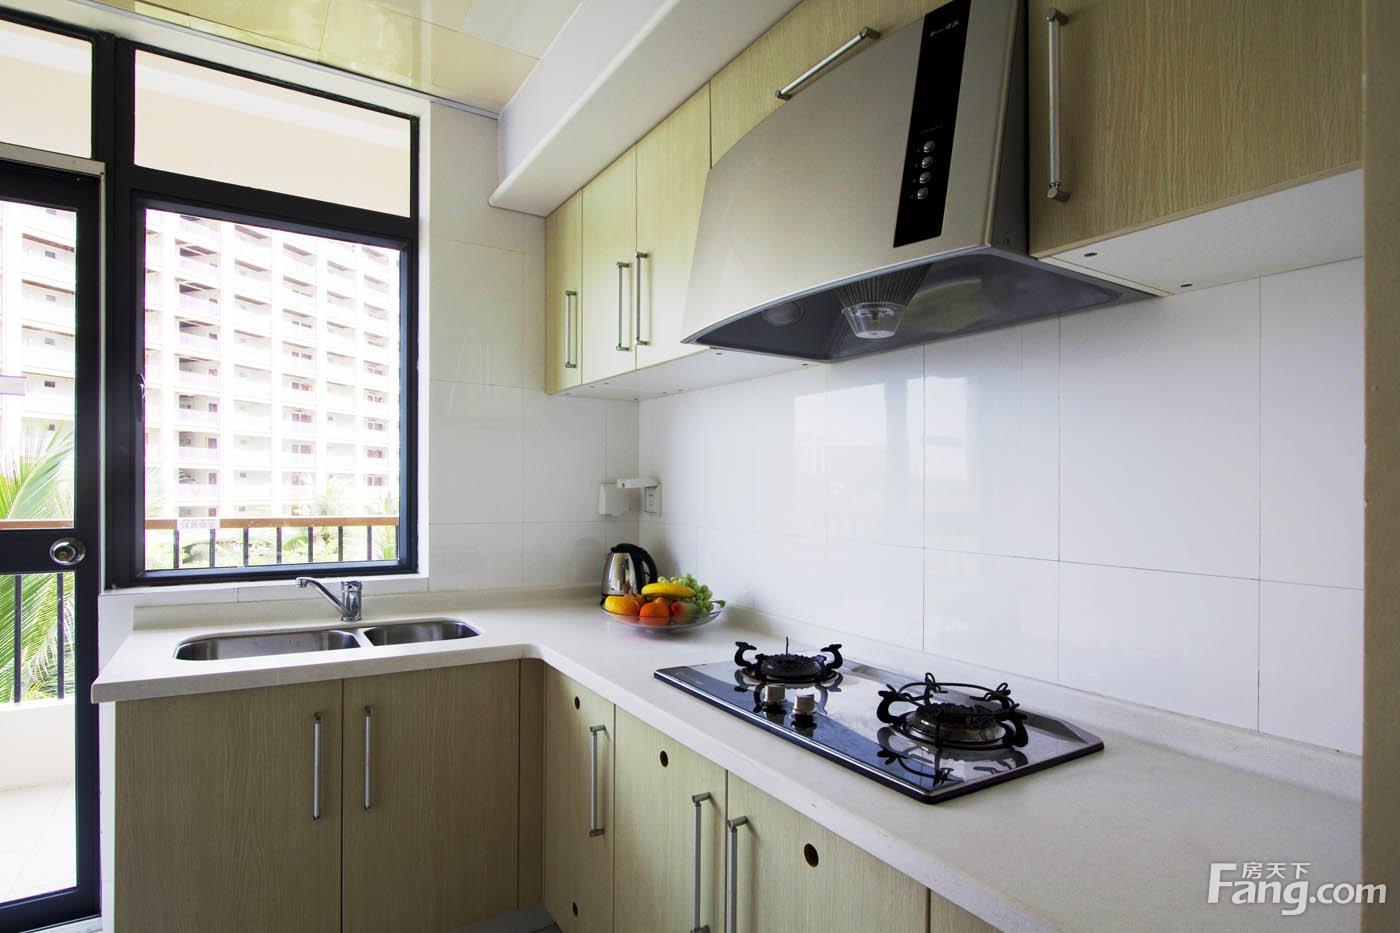 pantry kitchen wall shelving 如何选择厨房墙面玻璃厨房墙面材料有哪些 家居知识 房天下家居装修